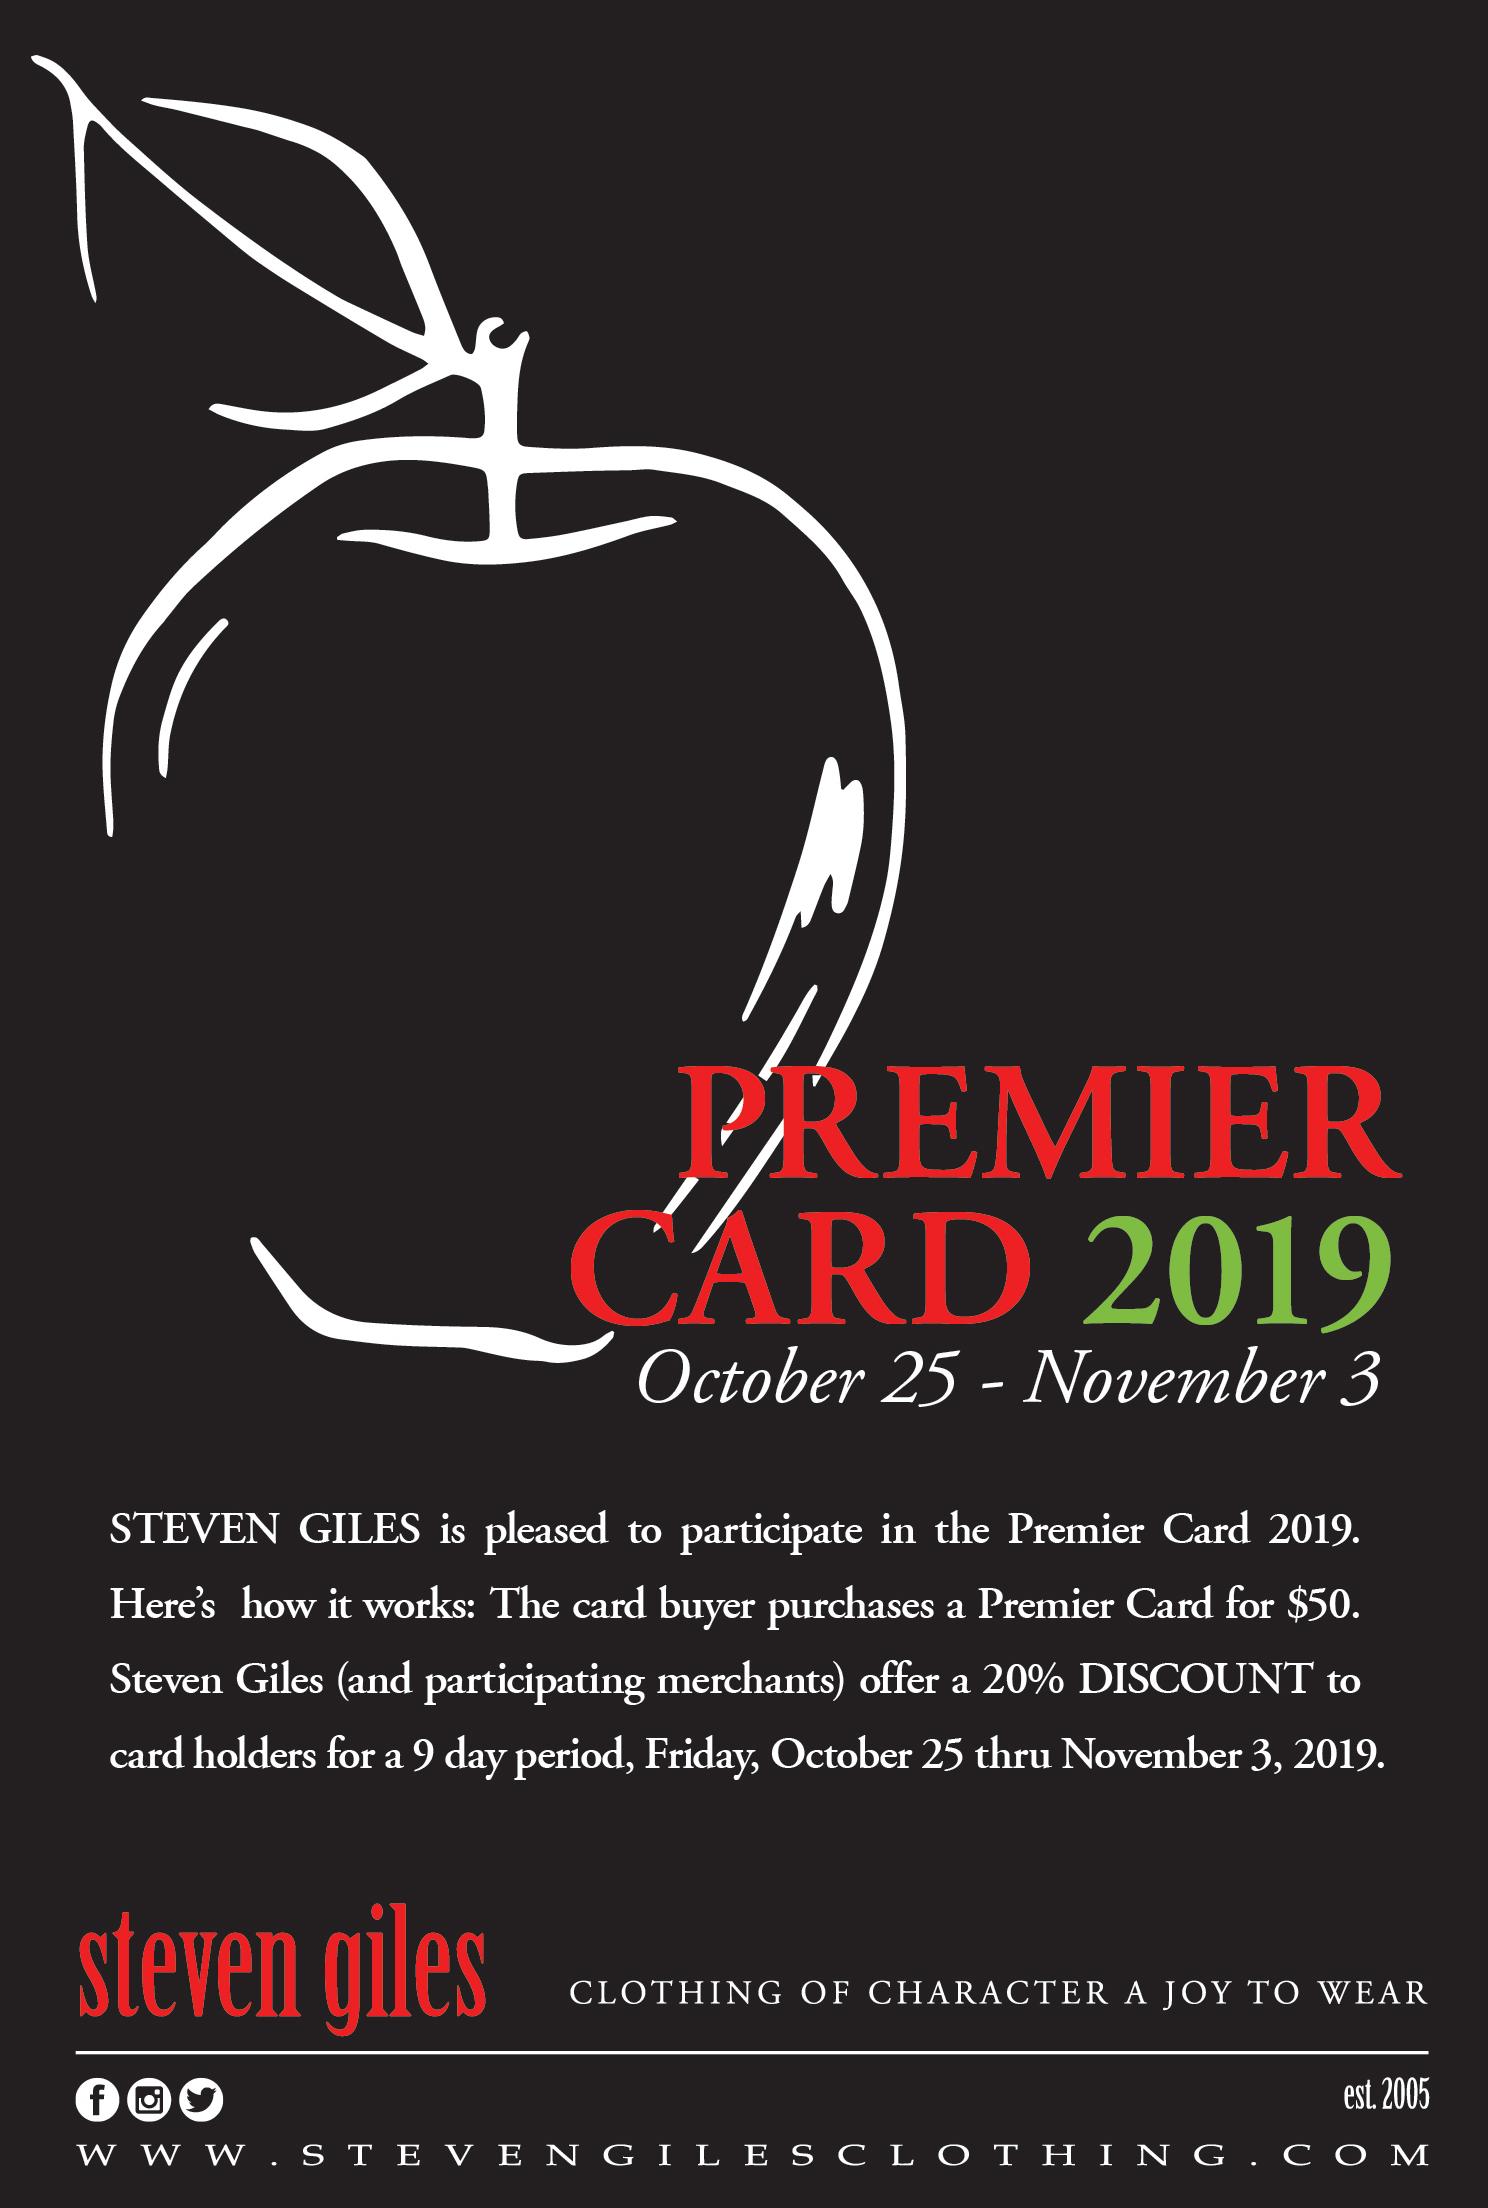 Premier Card 2019